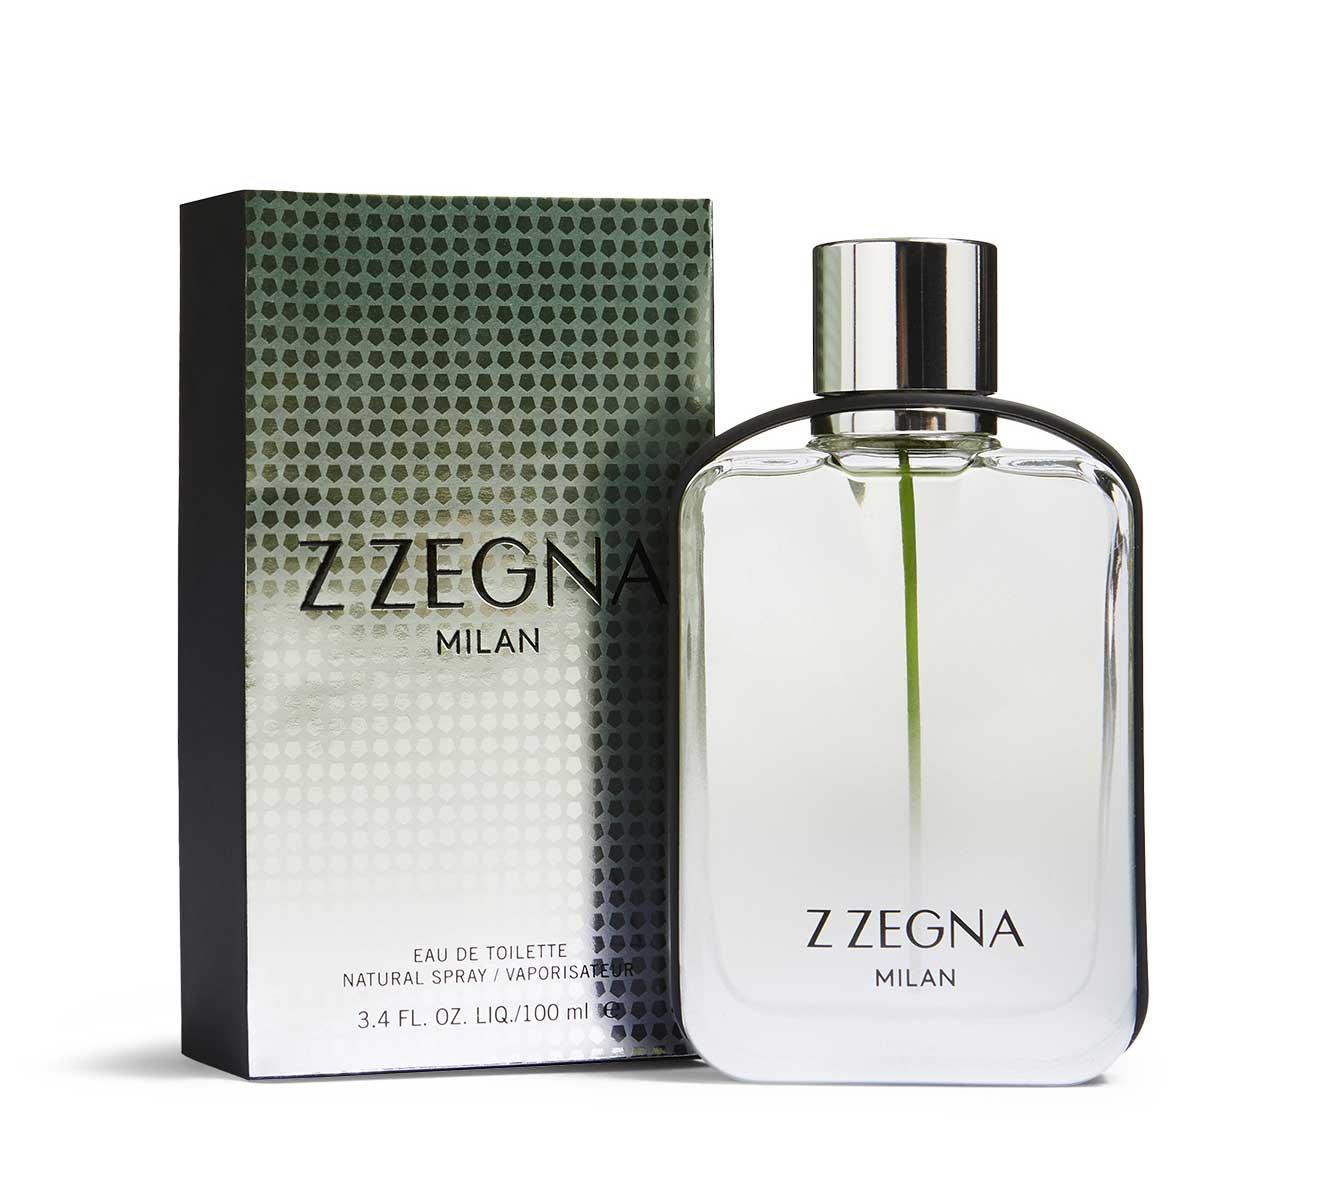 48e2541226b6d Z Zegna Milan Ermenegildo Zegna cologne - a fragrance for men 2016